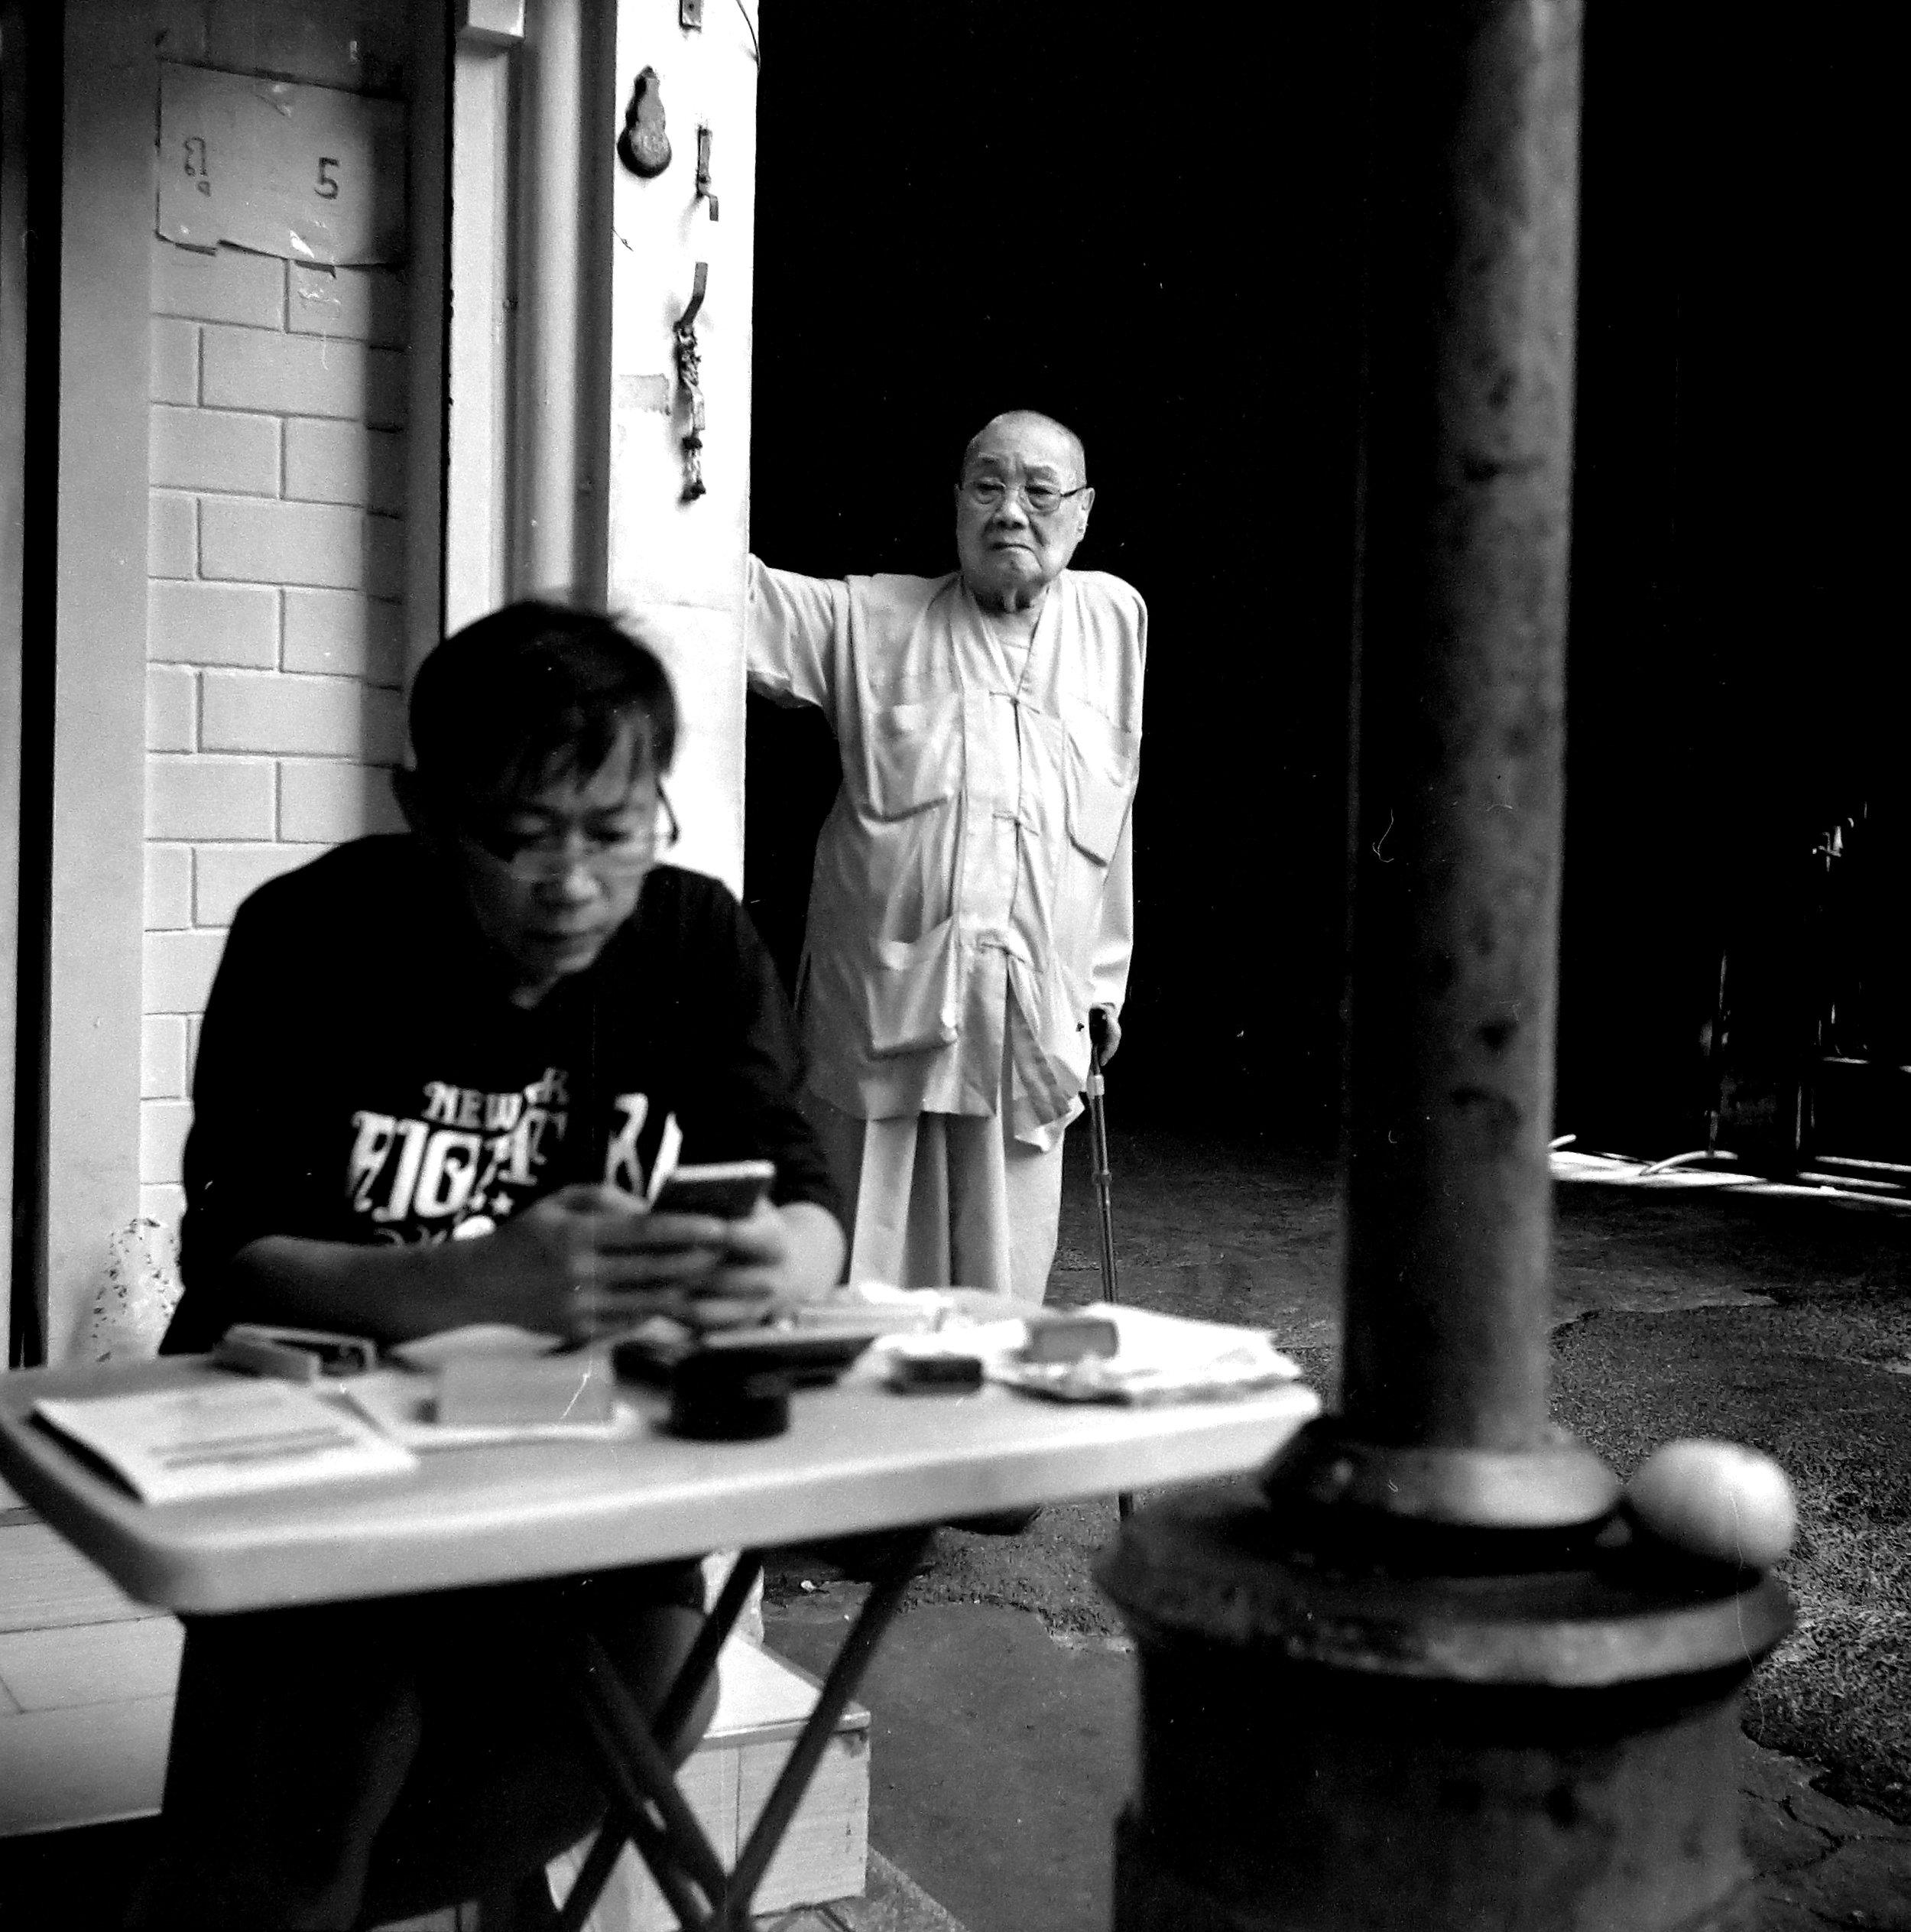 Chromacomaphoto Street photography guide bangkok thailand chinatown rolleiflex delta 400 (8).JPG